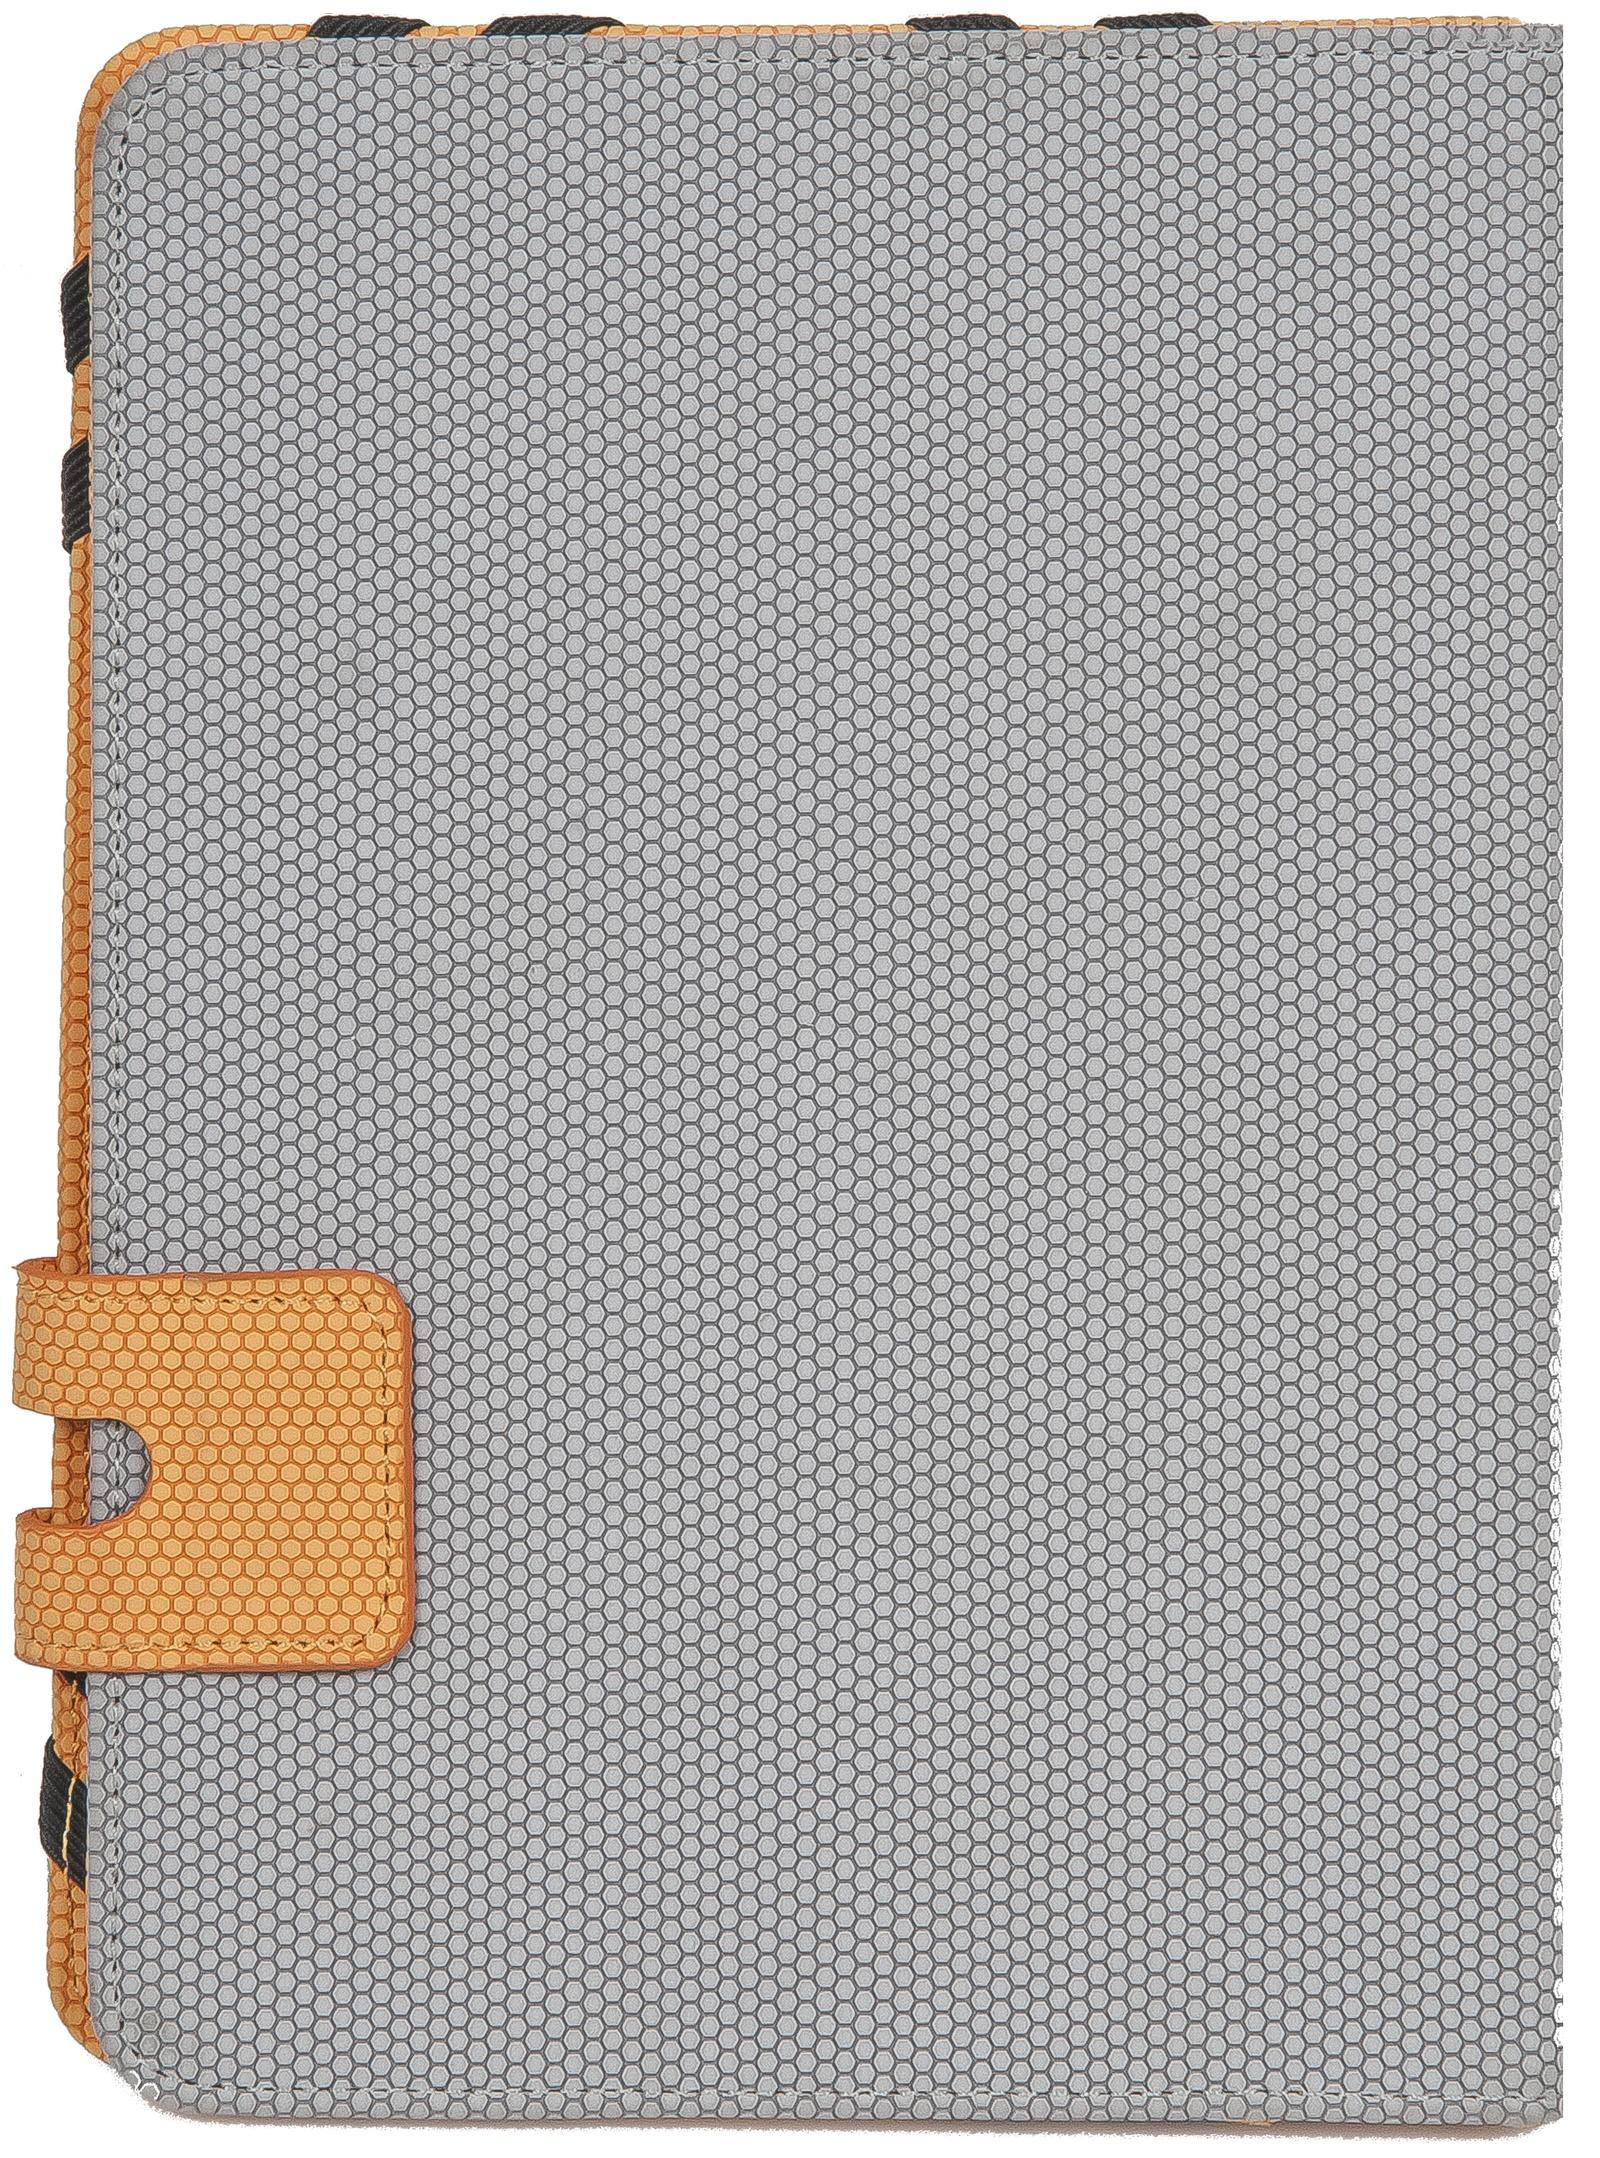 Чехол для планшета Defender Favo uni, 26062, серый, оранжевый цена